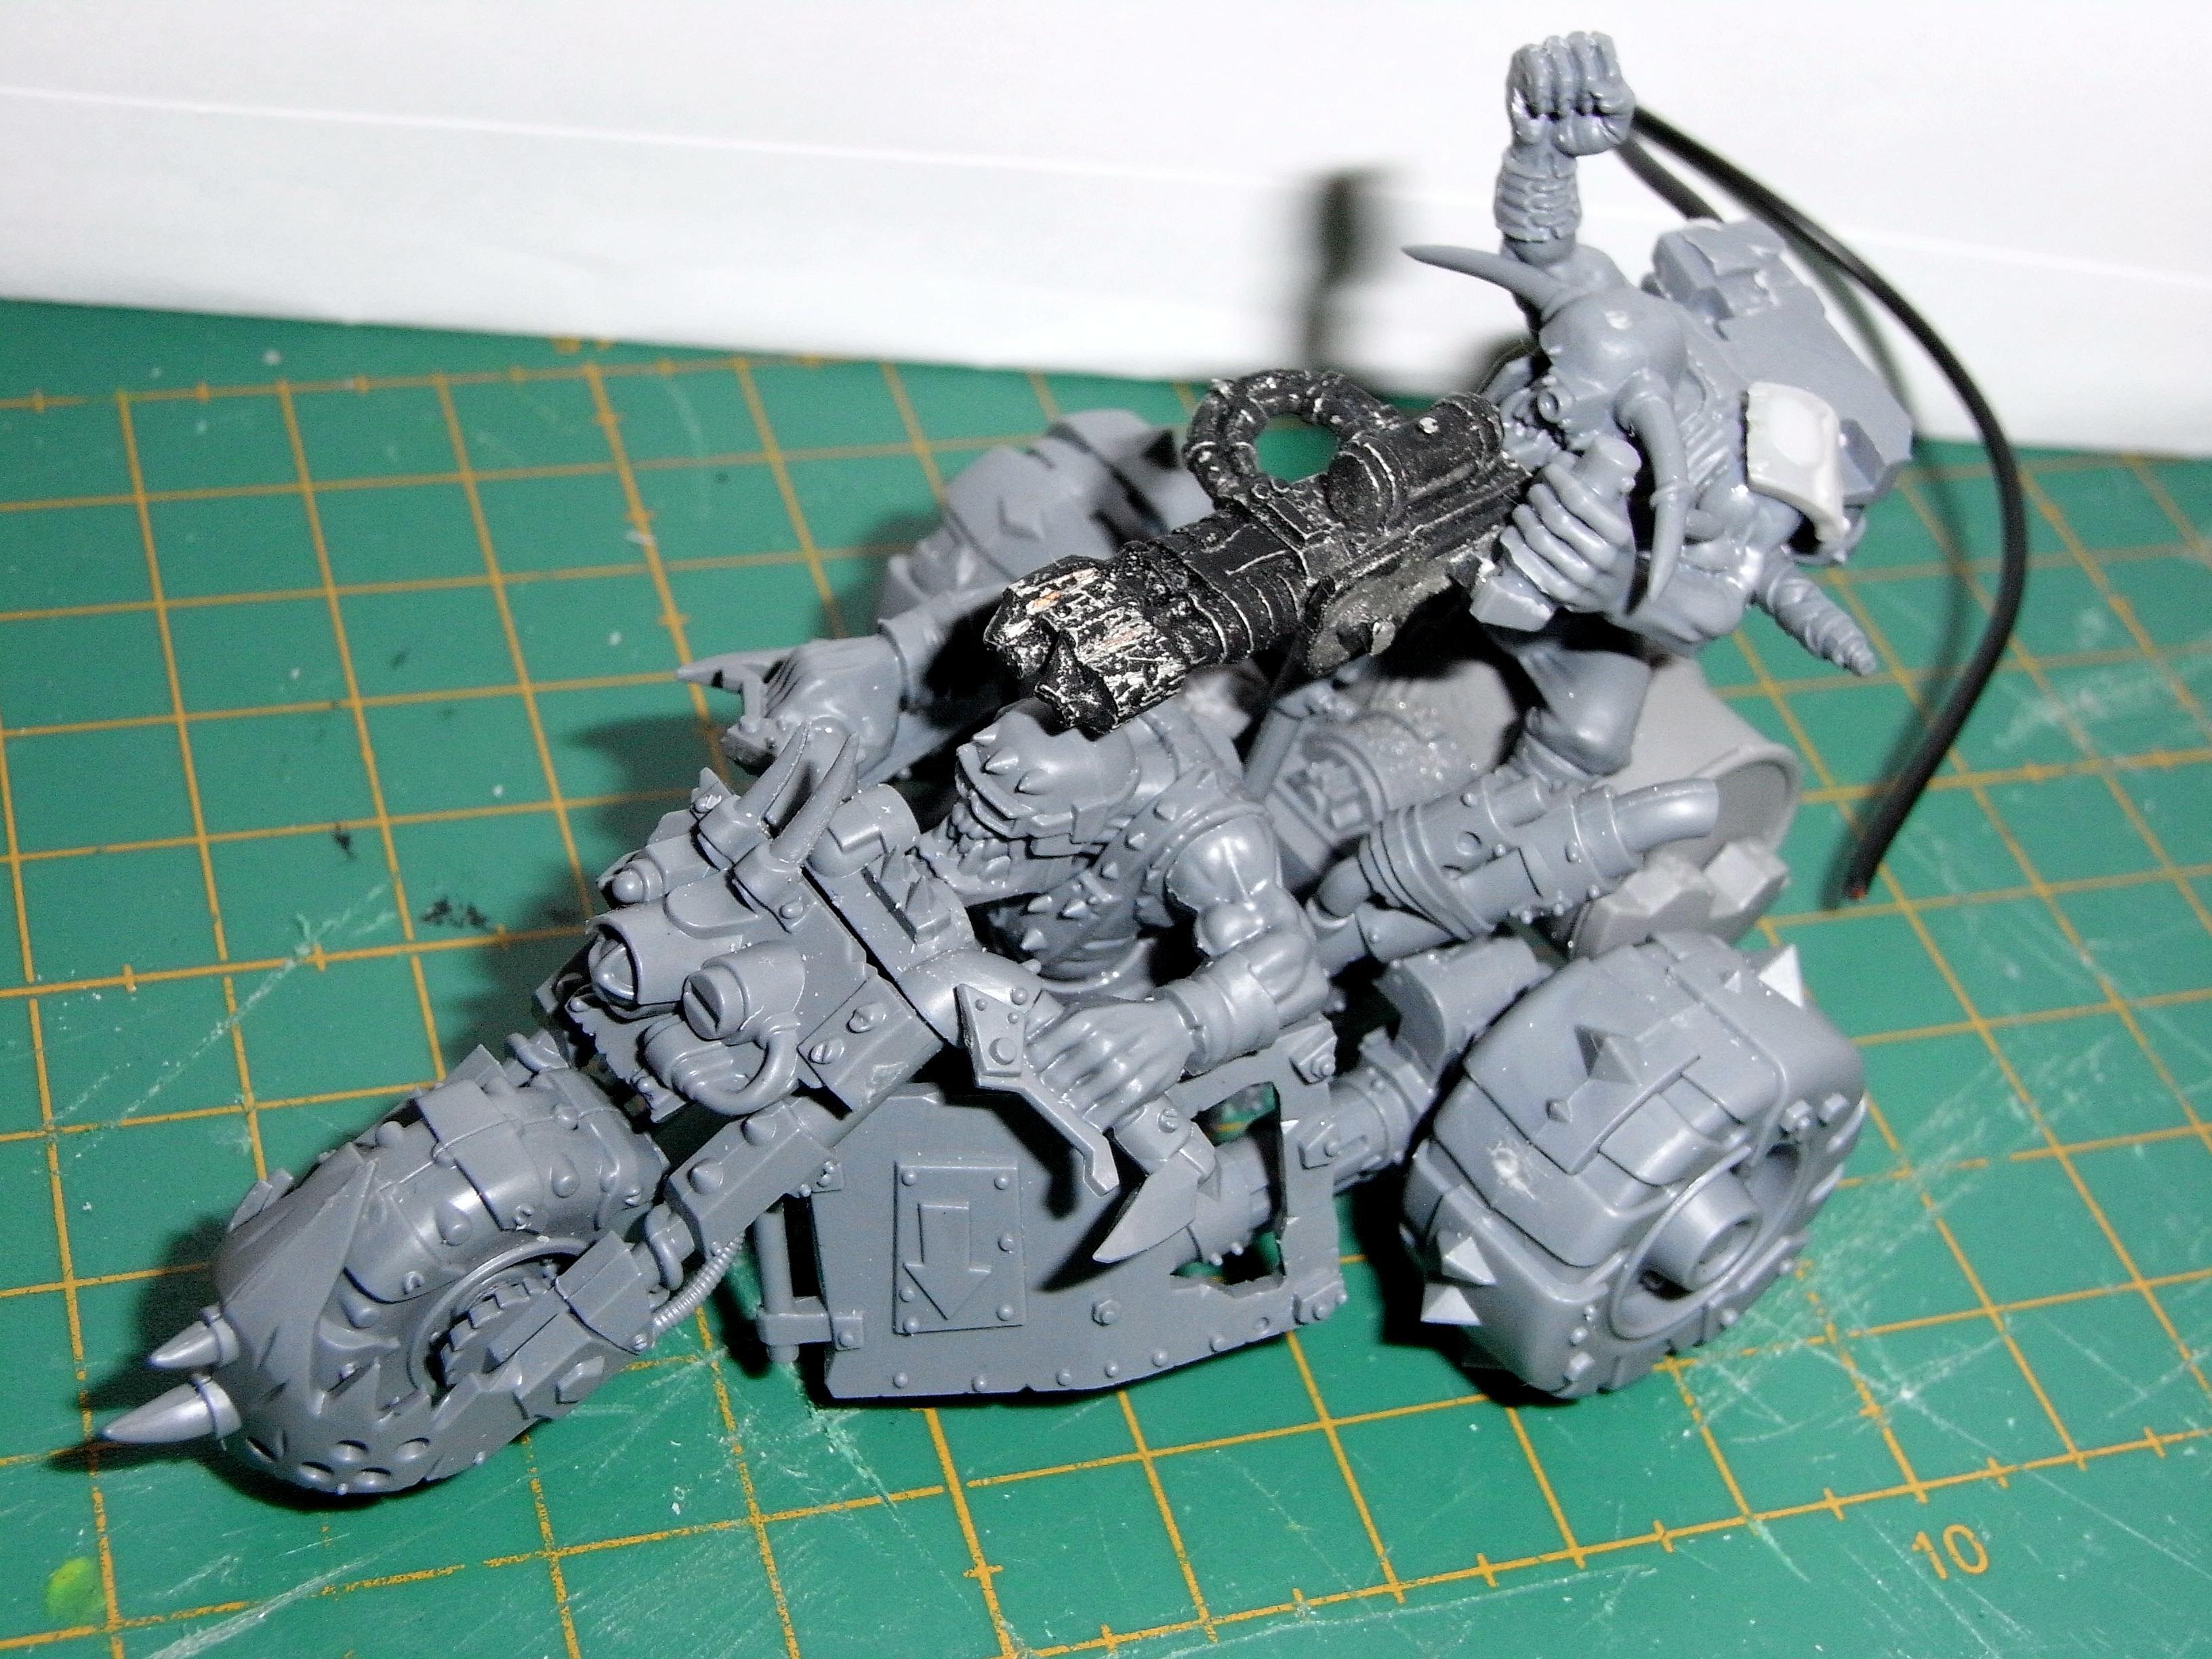 3 Wheeled, Burna Boyz, Orks, Skorcha, Warbike, Warbuggy, Wartrakk, Work In Progress